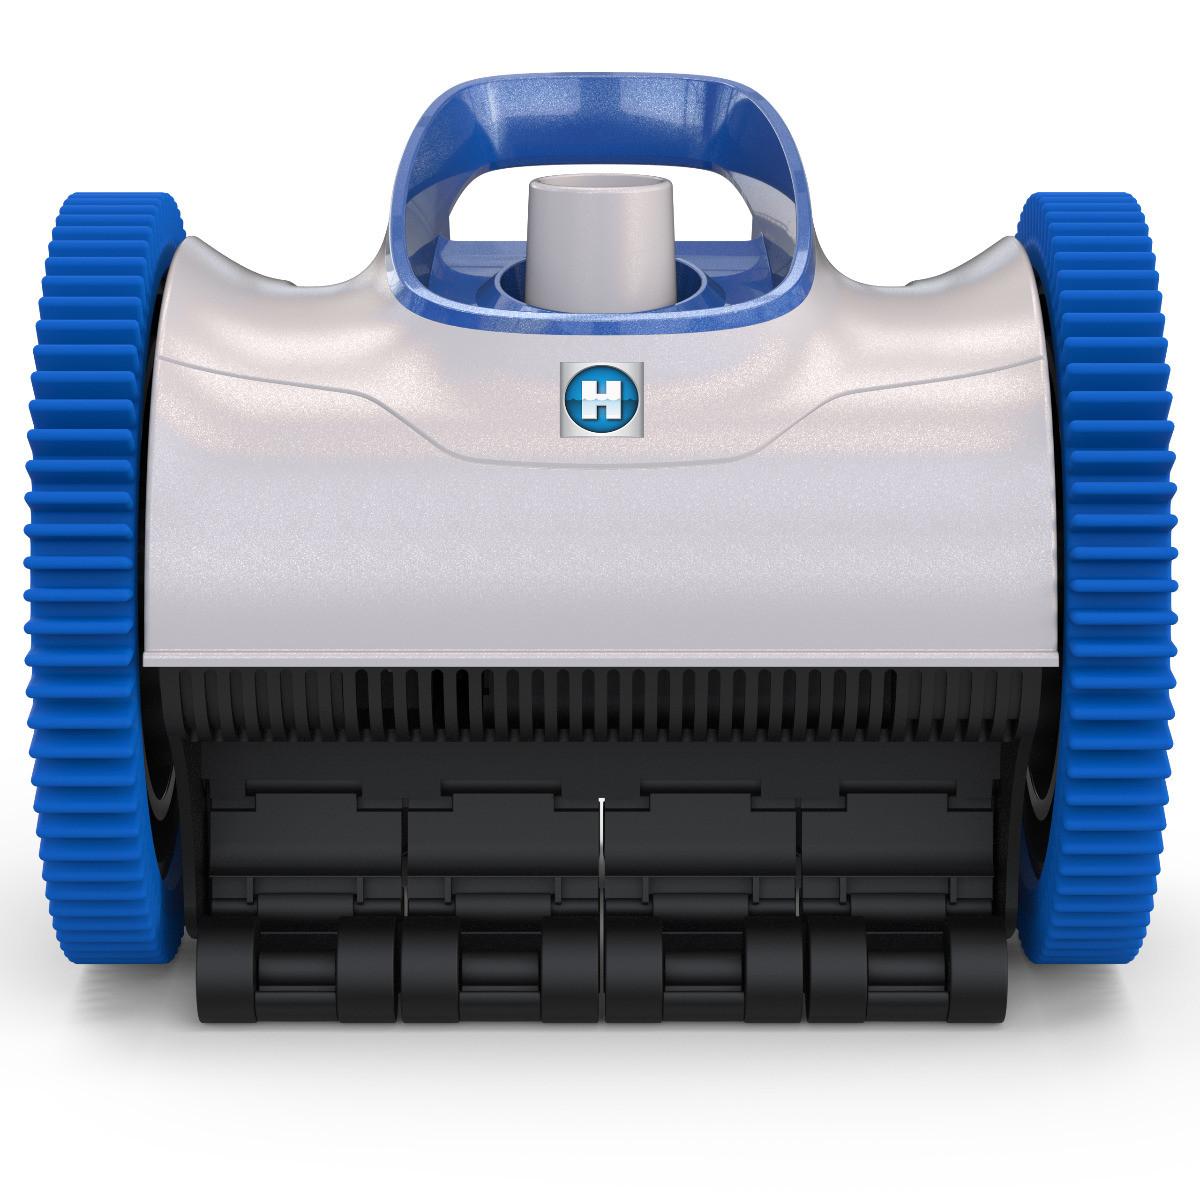 Hayward AquaNaut 200 Advanced Turbine Cleaner